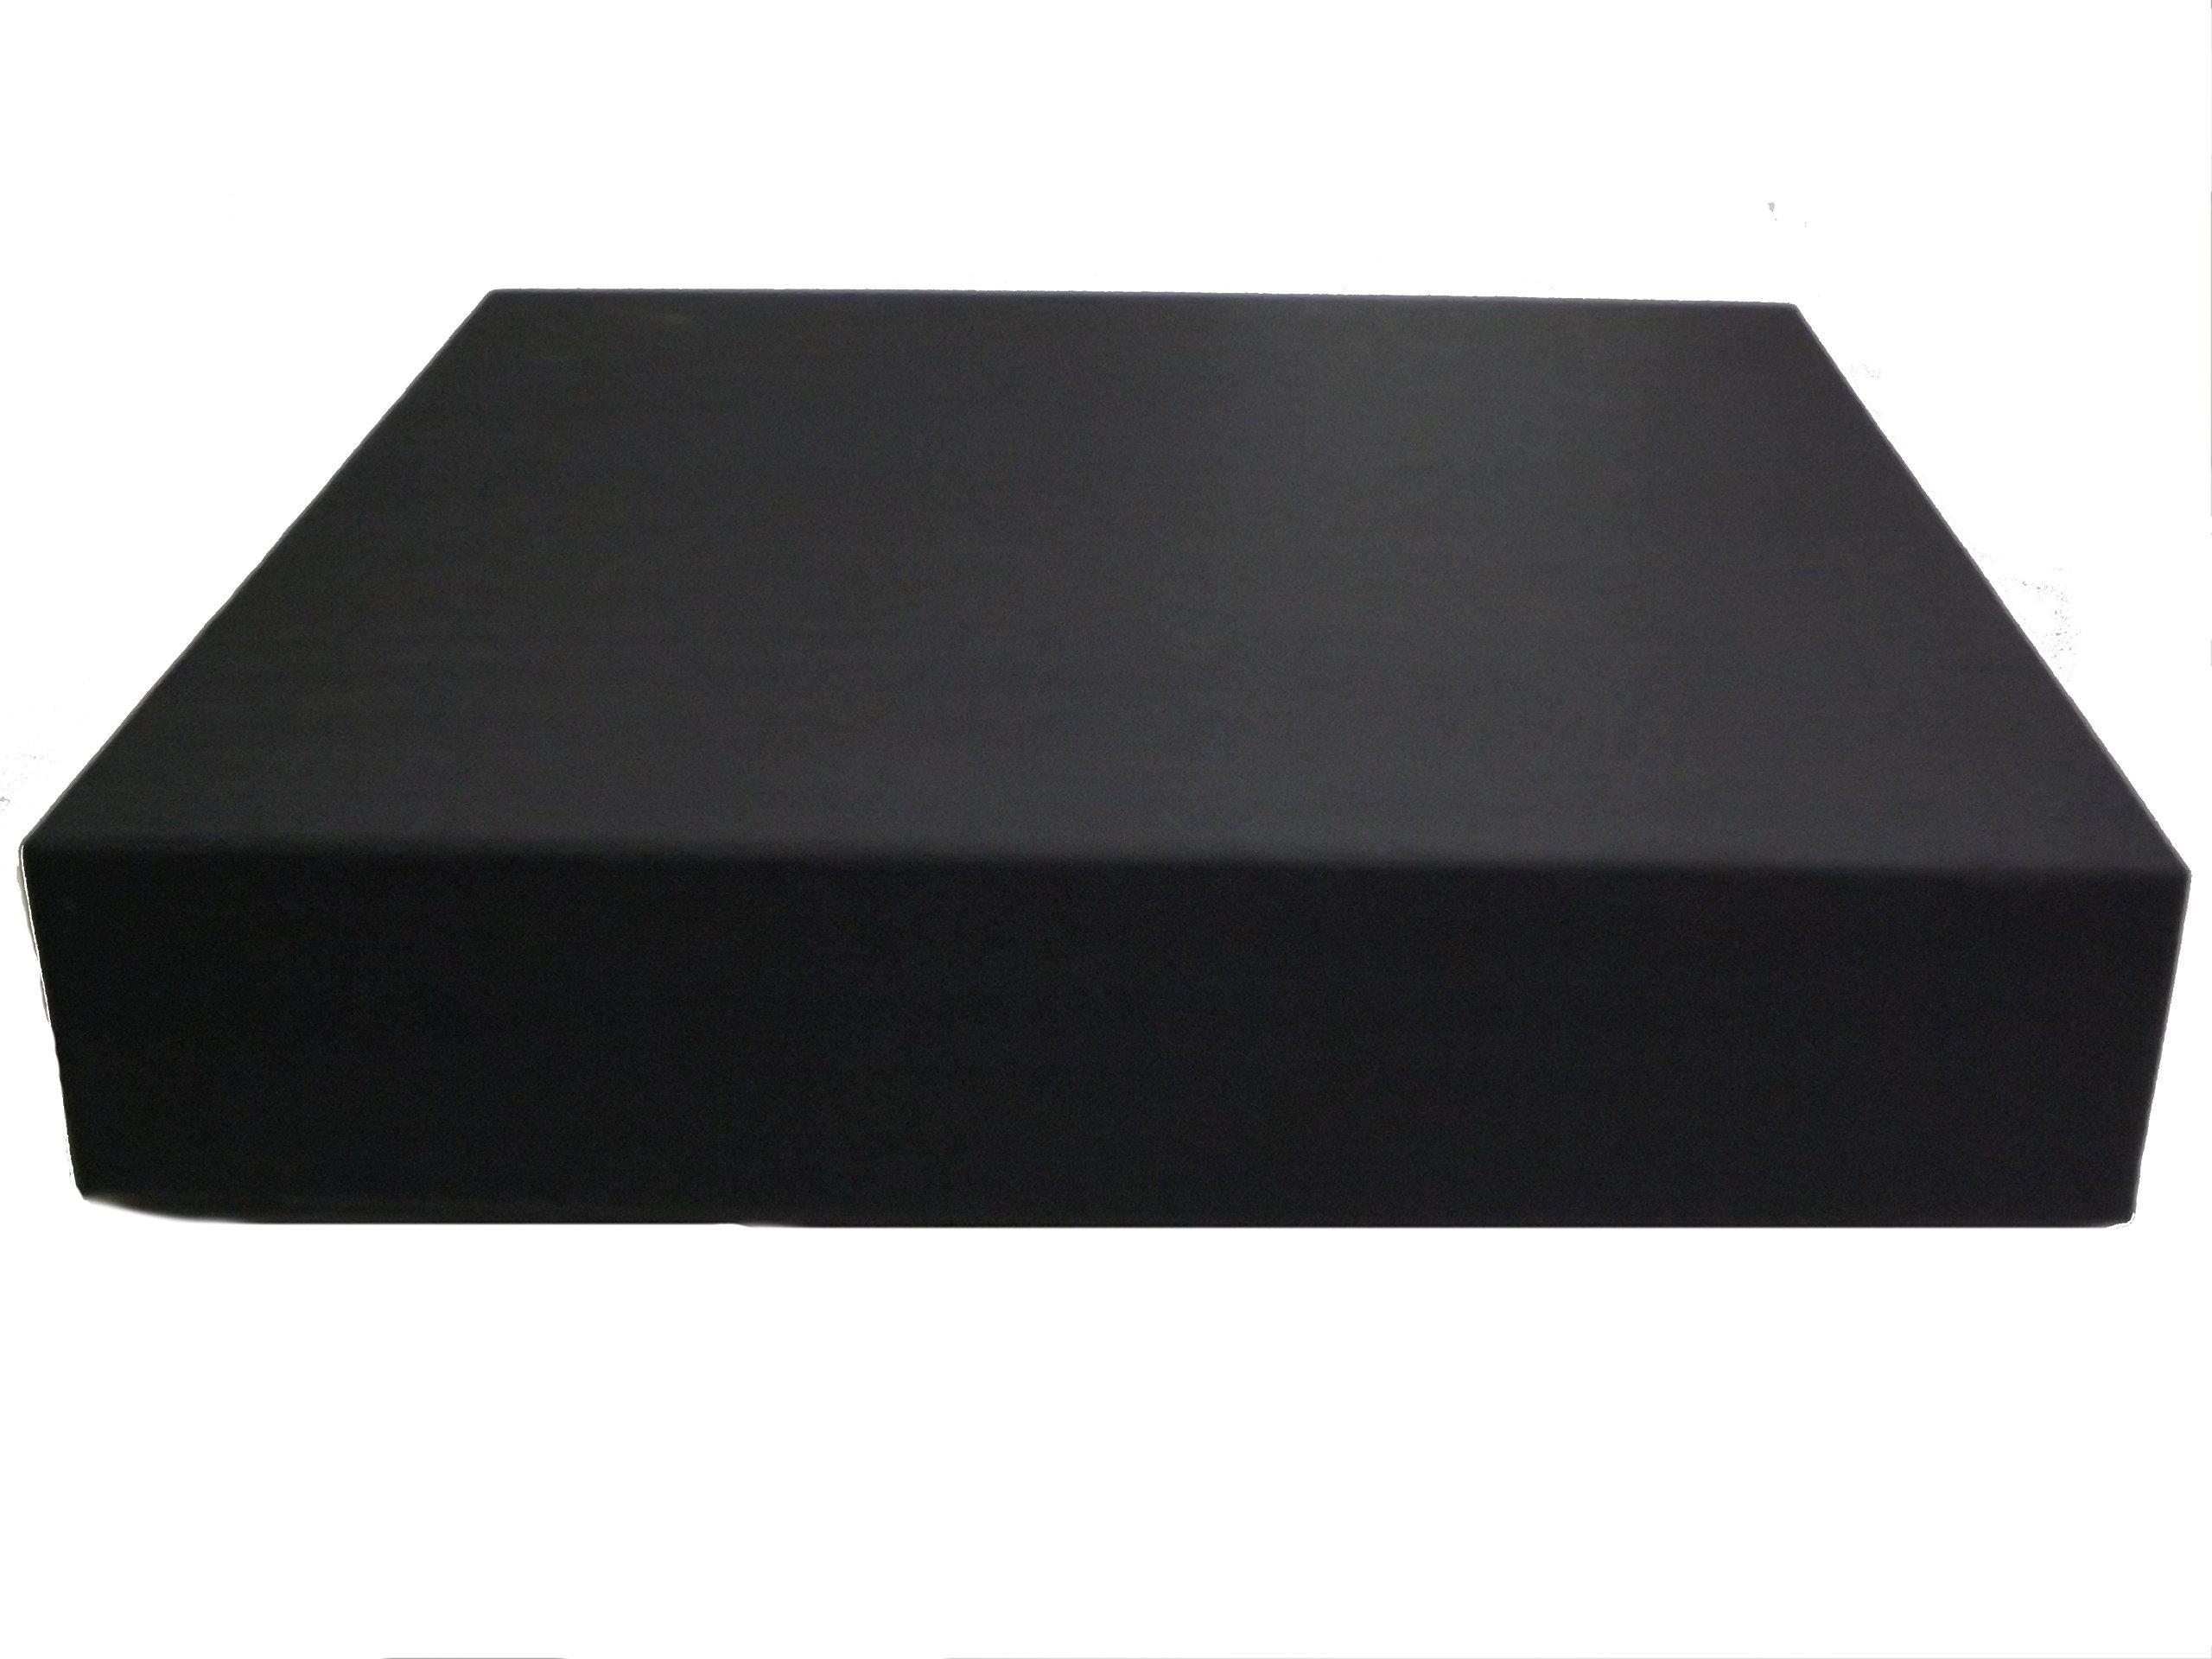 Showoff Albums 12X12 ALBUM BOX/GIFT BOX (2.5'' DEPTH), BLACK (SET OF 12)